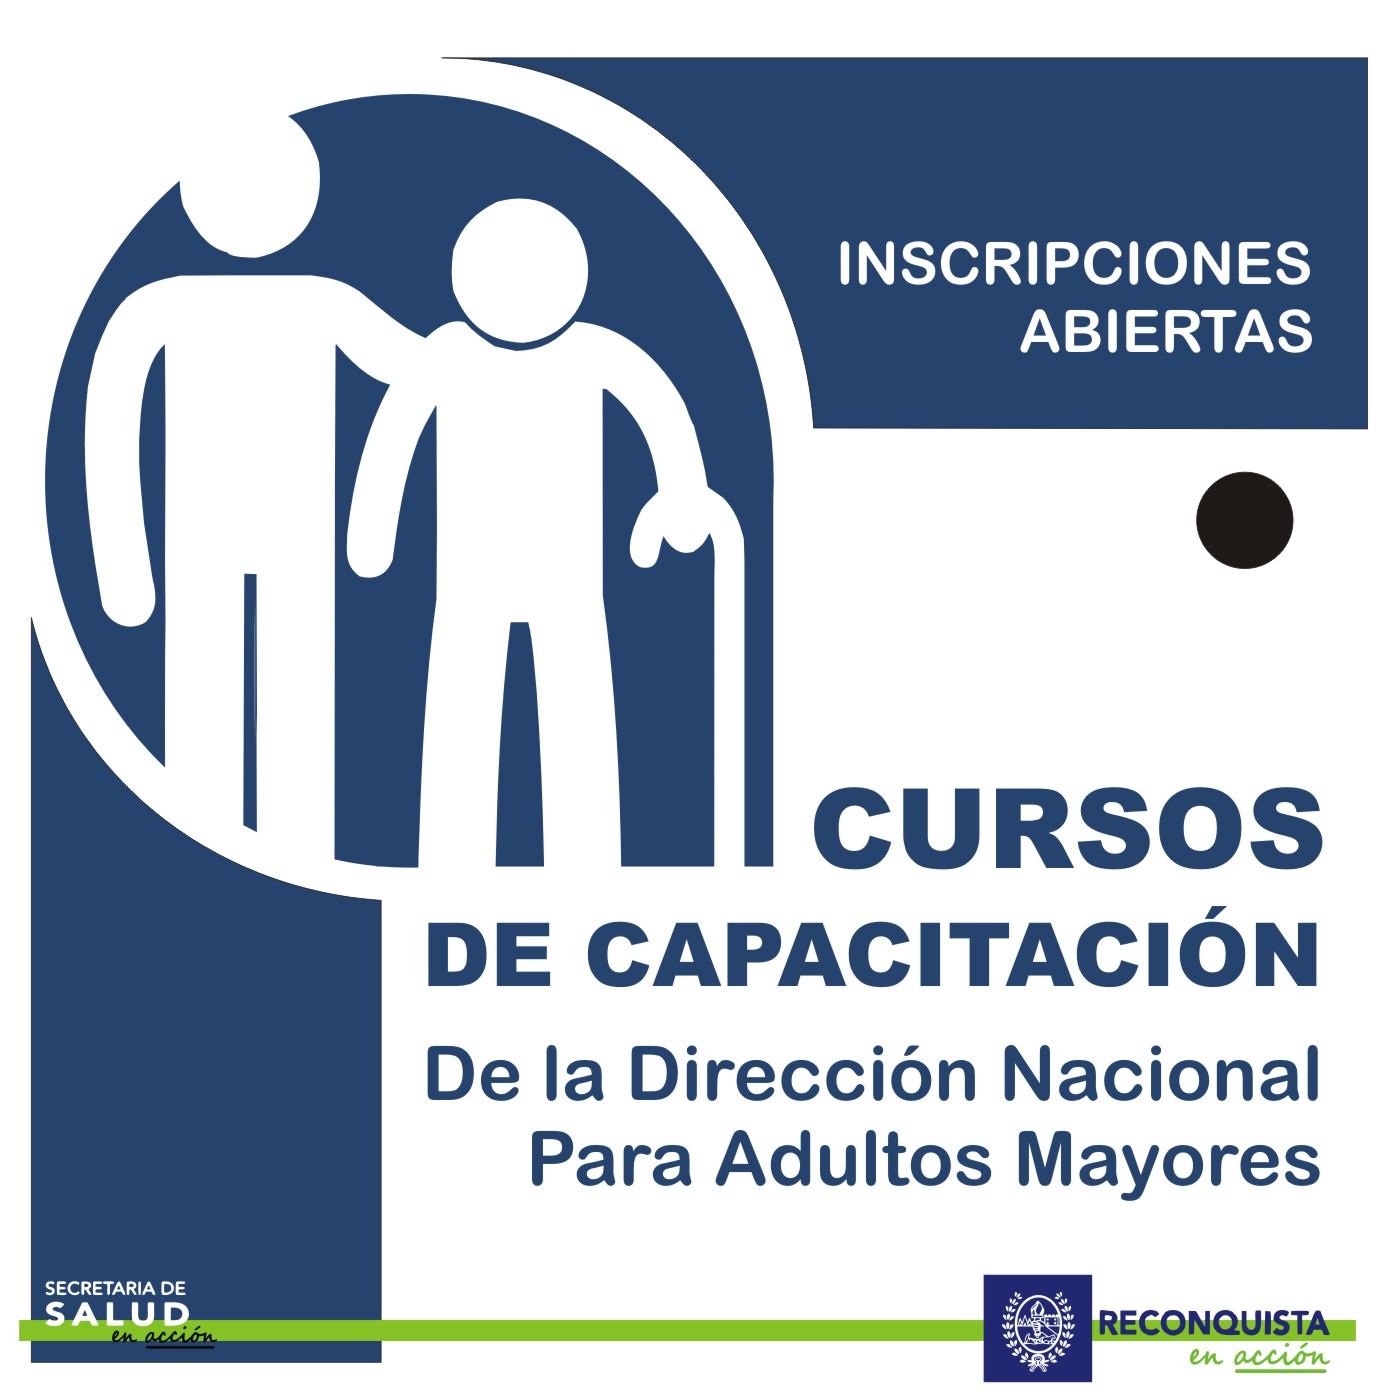 Cursos de capacitaci n de la direcci n nacional para for Municipalidad de avellaneda cursos